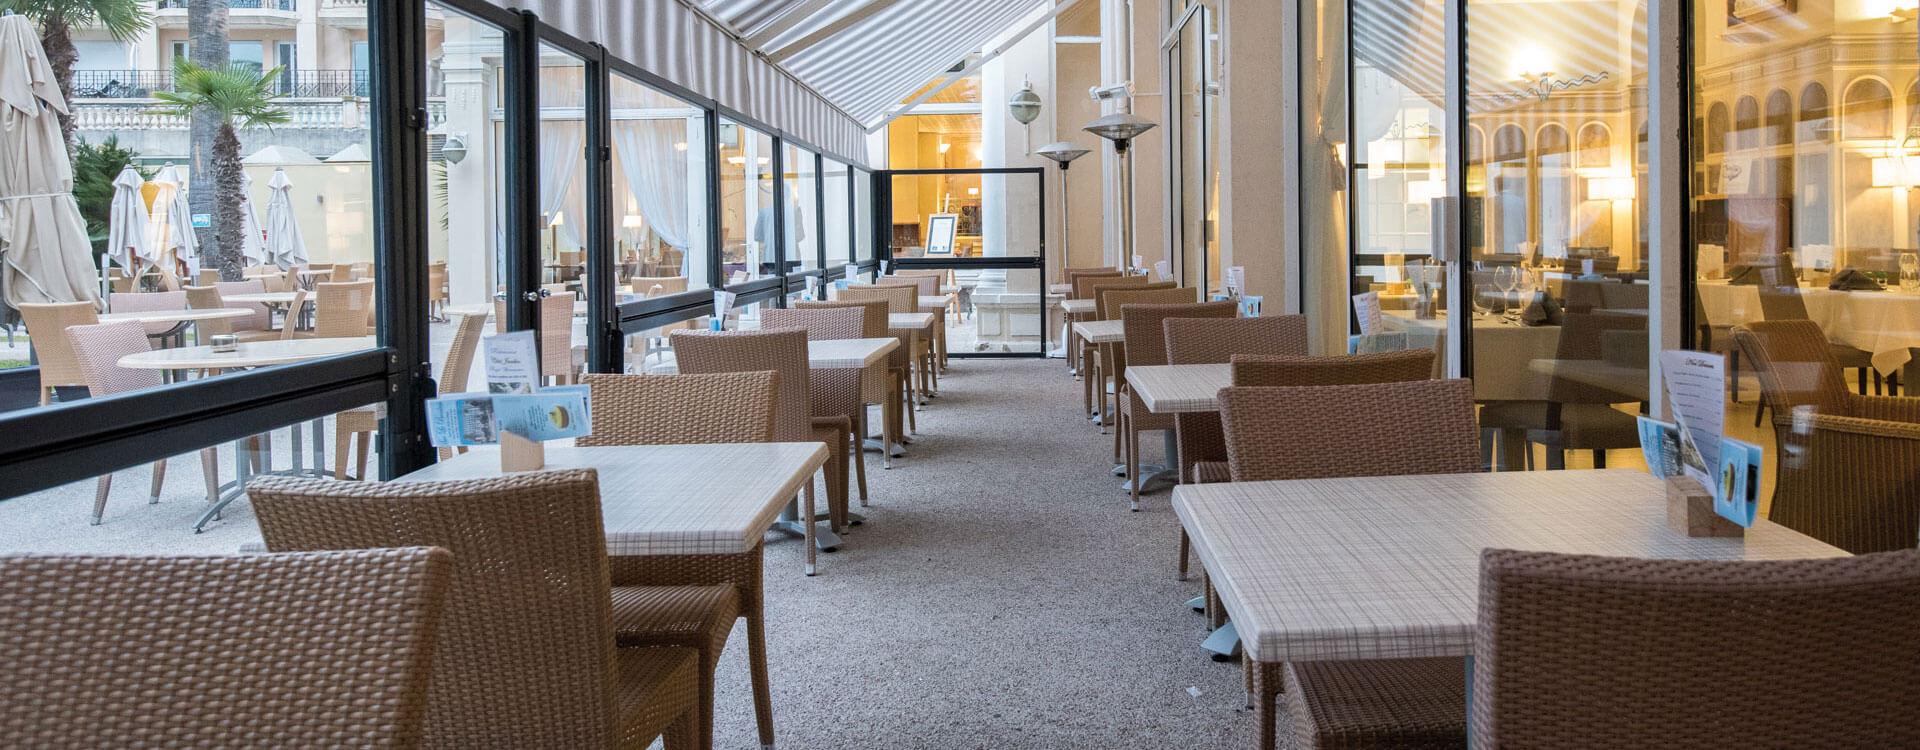 Restaurants - Hôtel*** Royal Westminster à Menton